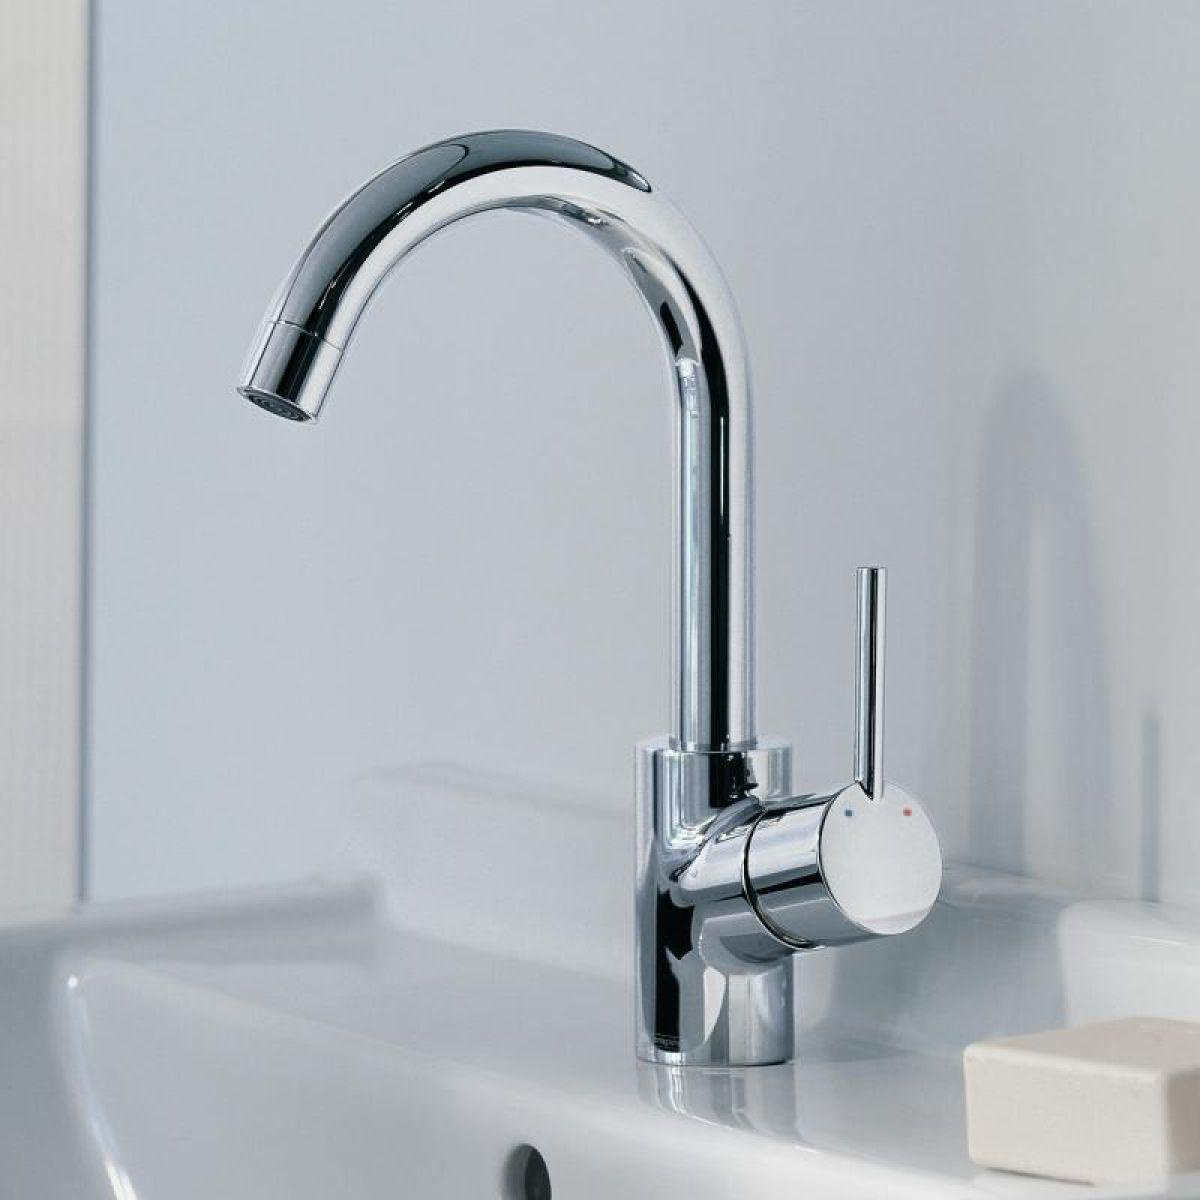 hansgrohe talis 39 s single lever basin mixer uk bathrooms. Black Bedroom Furniture Sets. Home Design Ideas